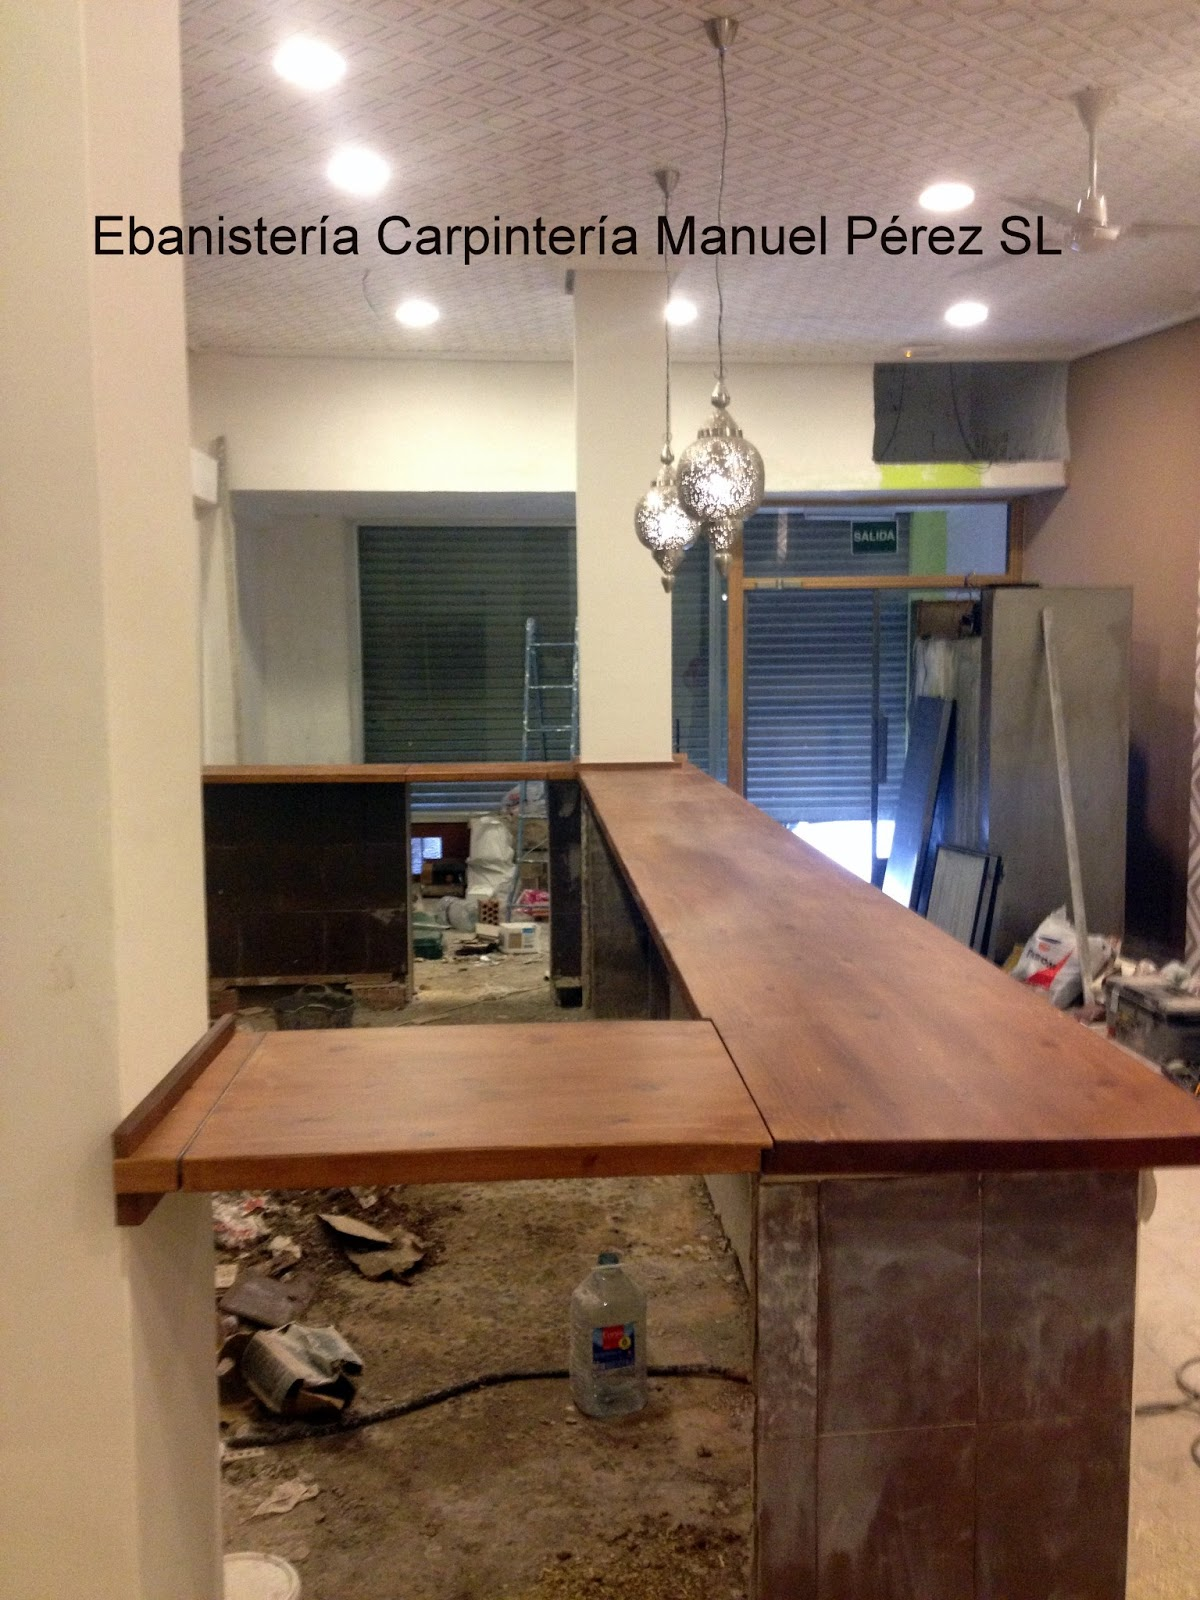 Ebanisteria carpinteria manuel perez zaragoza barra for Bar en madera moderno